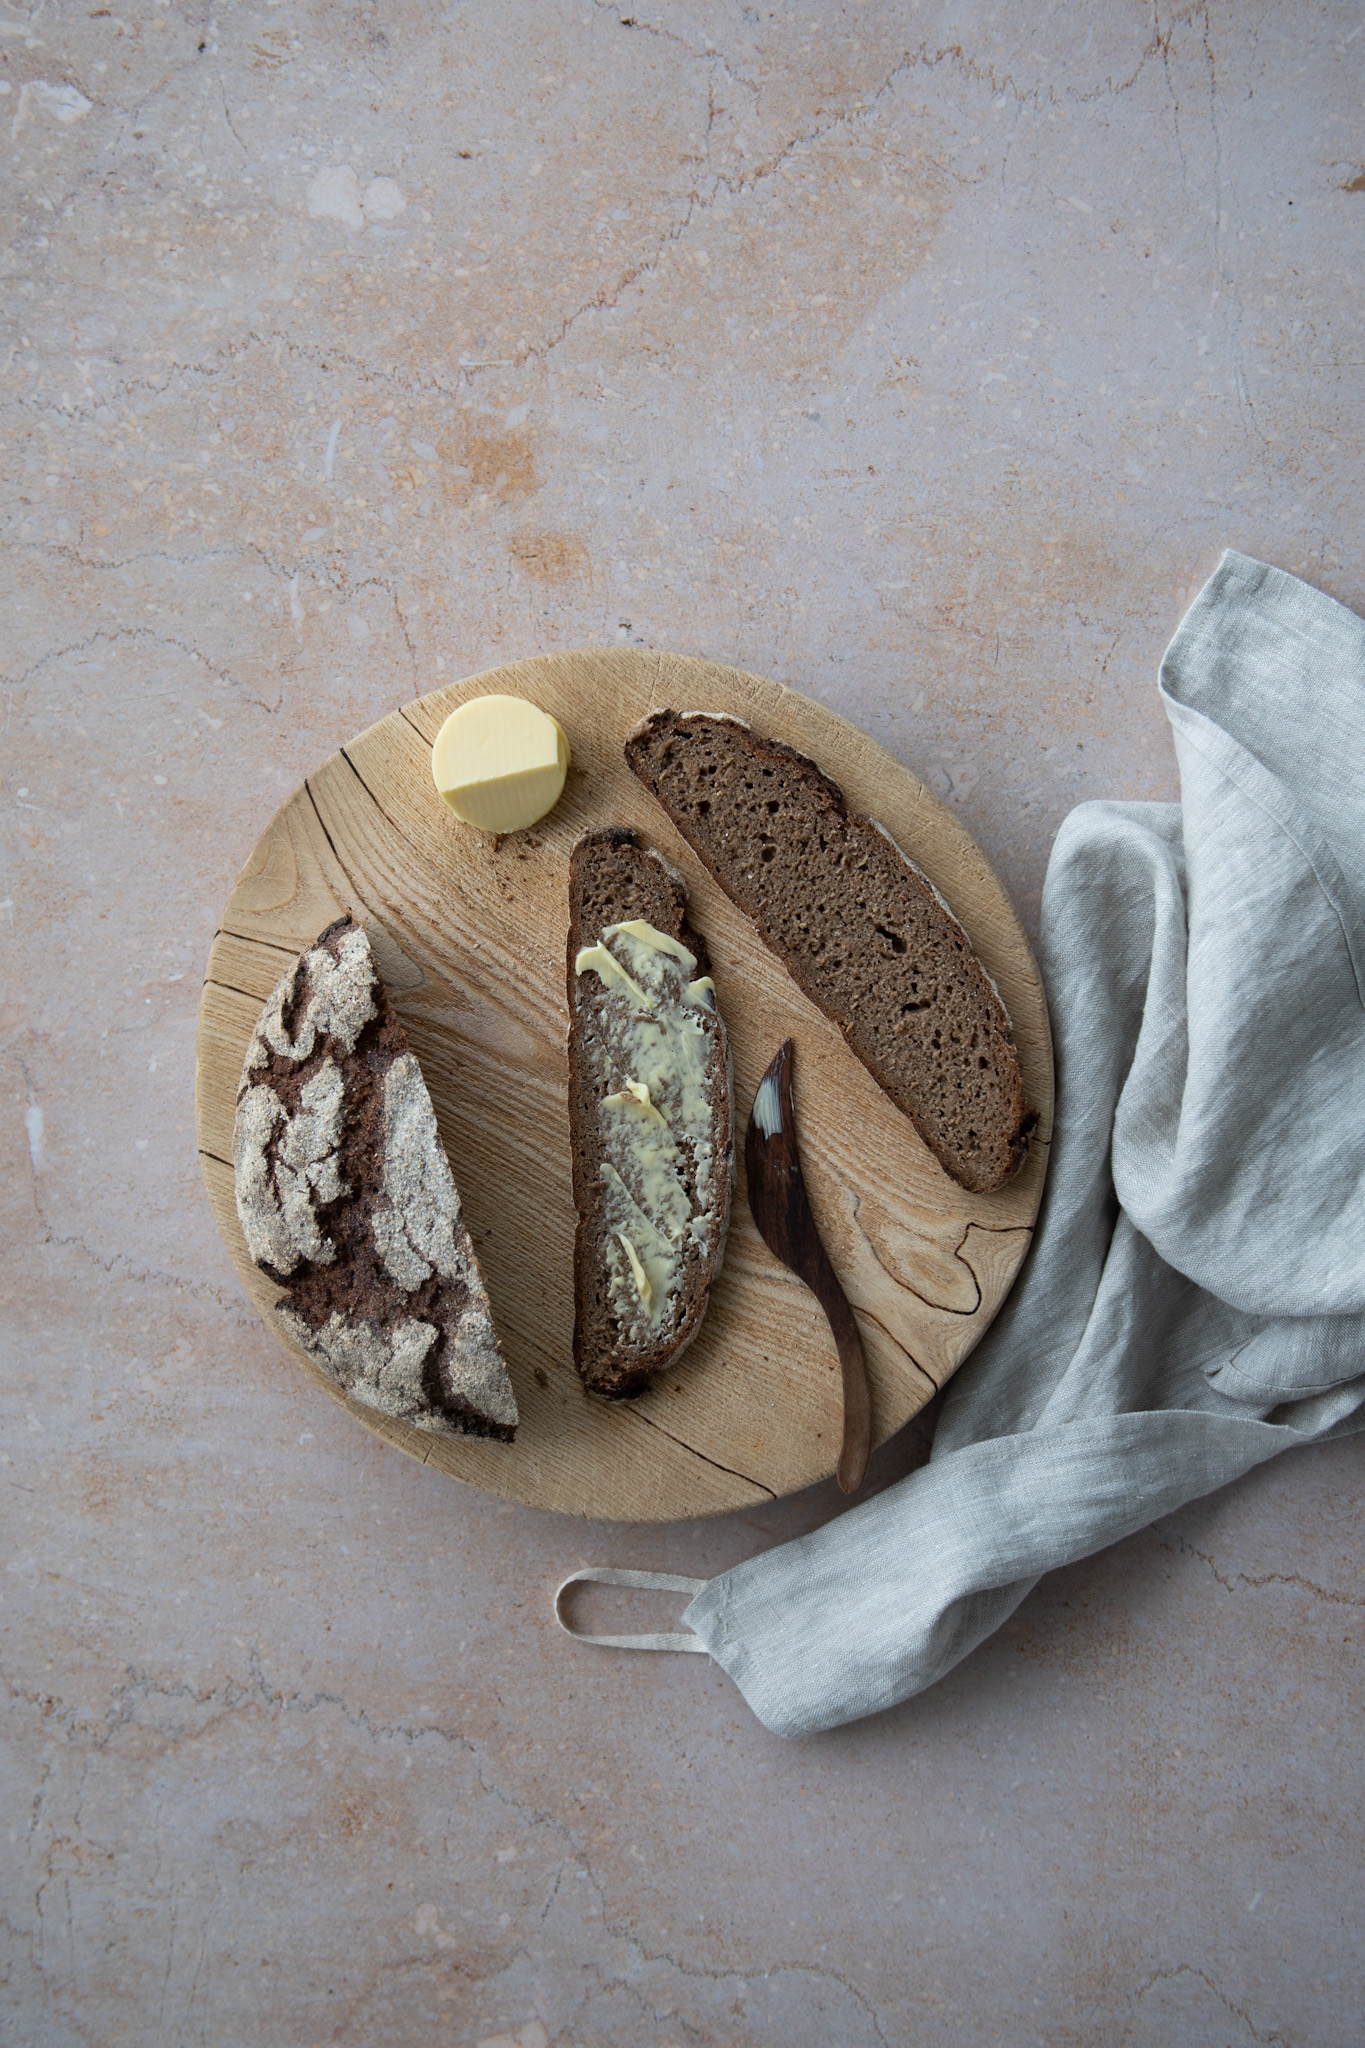 Finnish sourdough rye